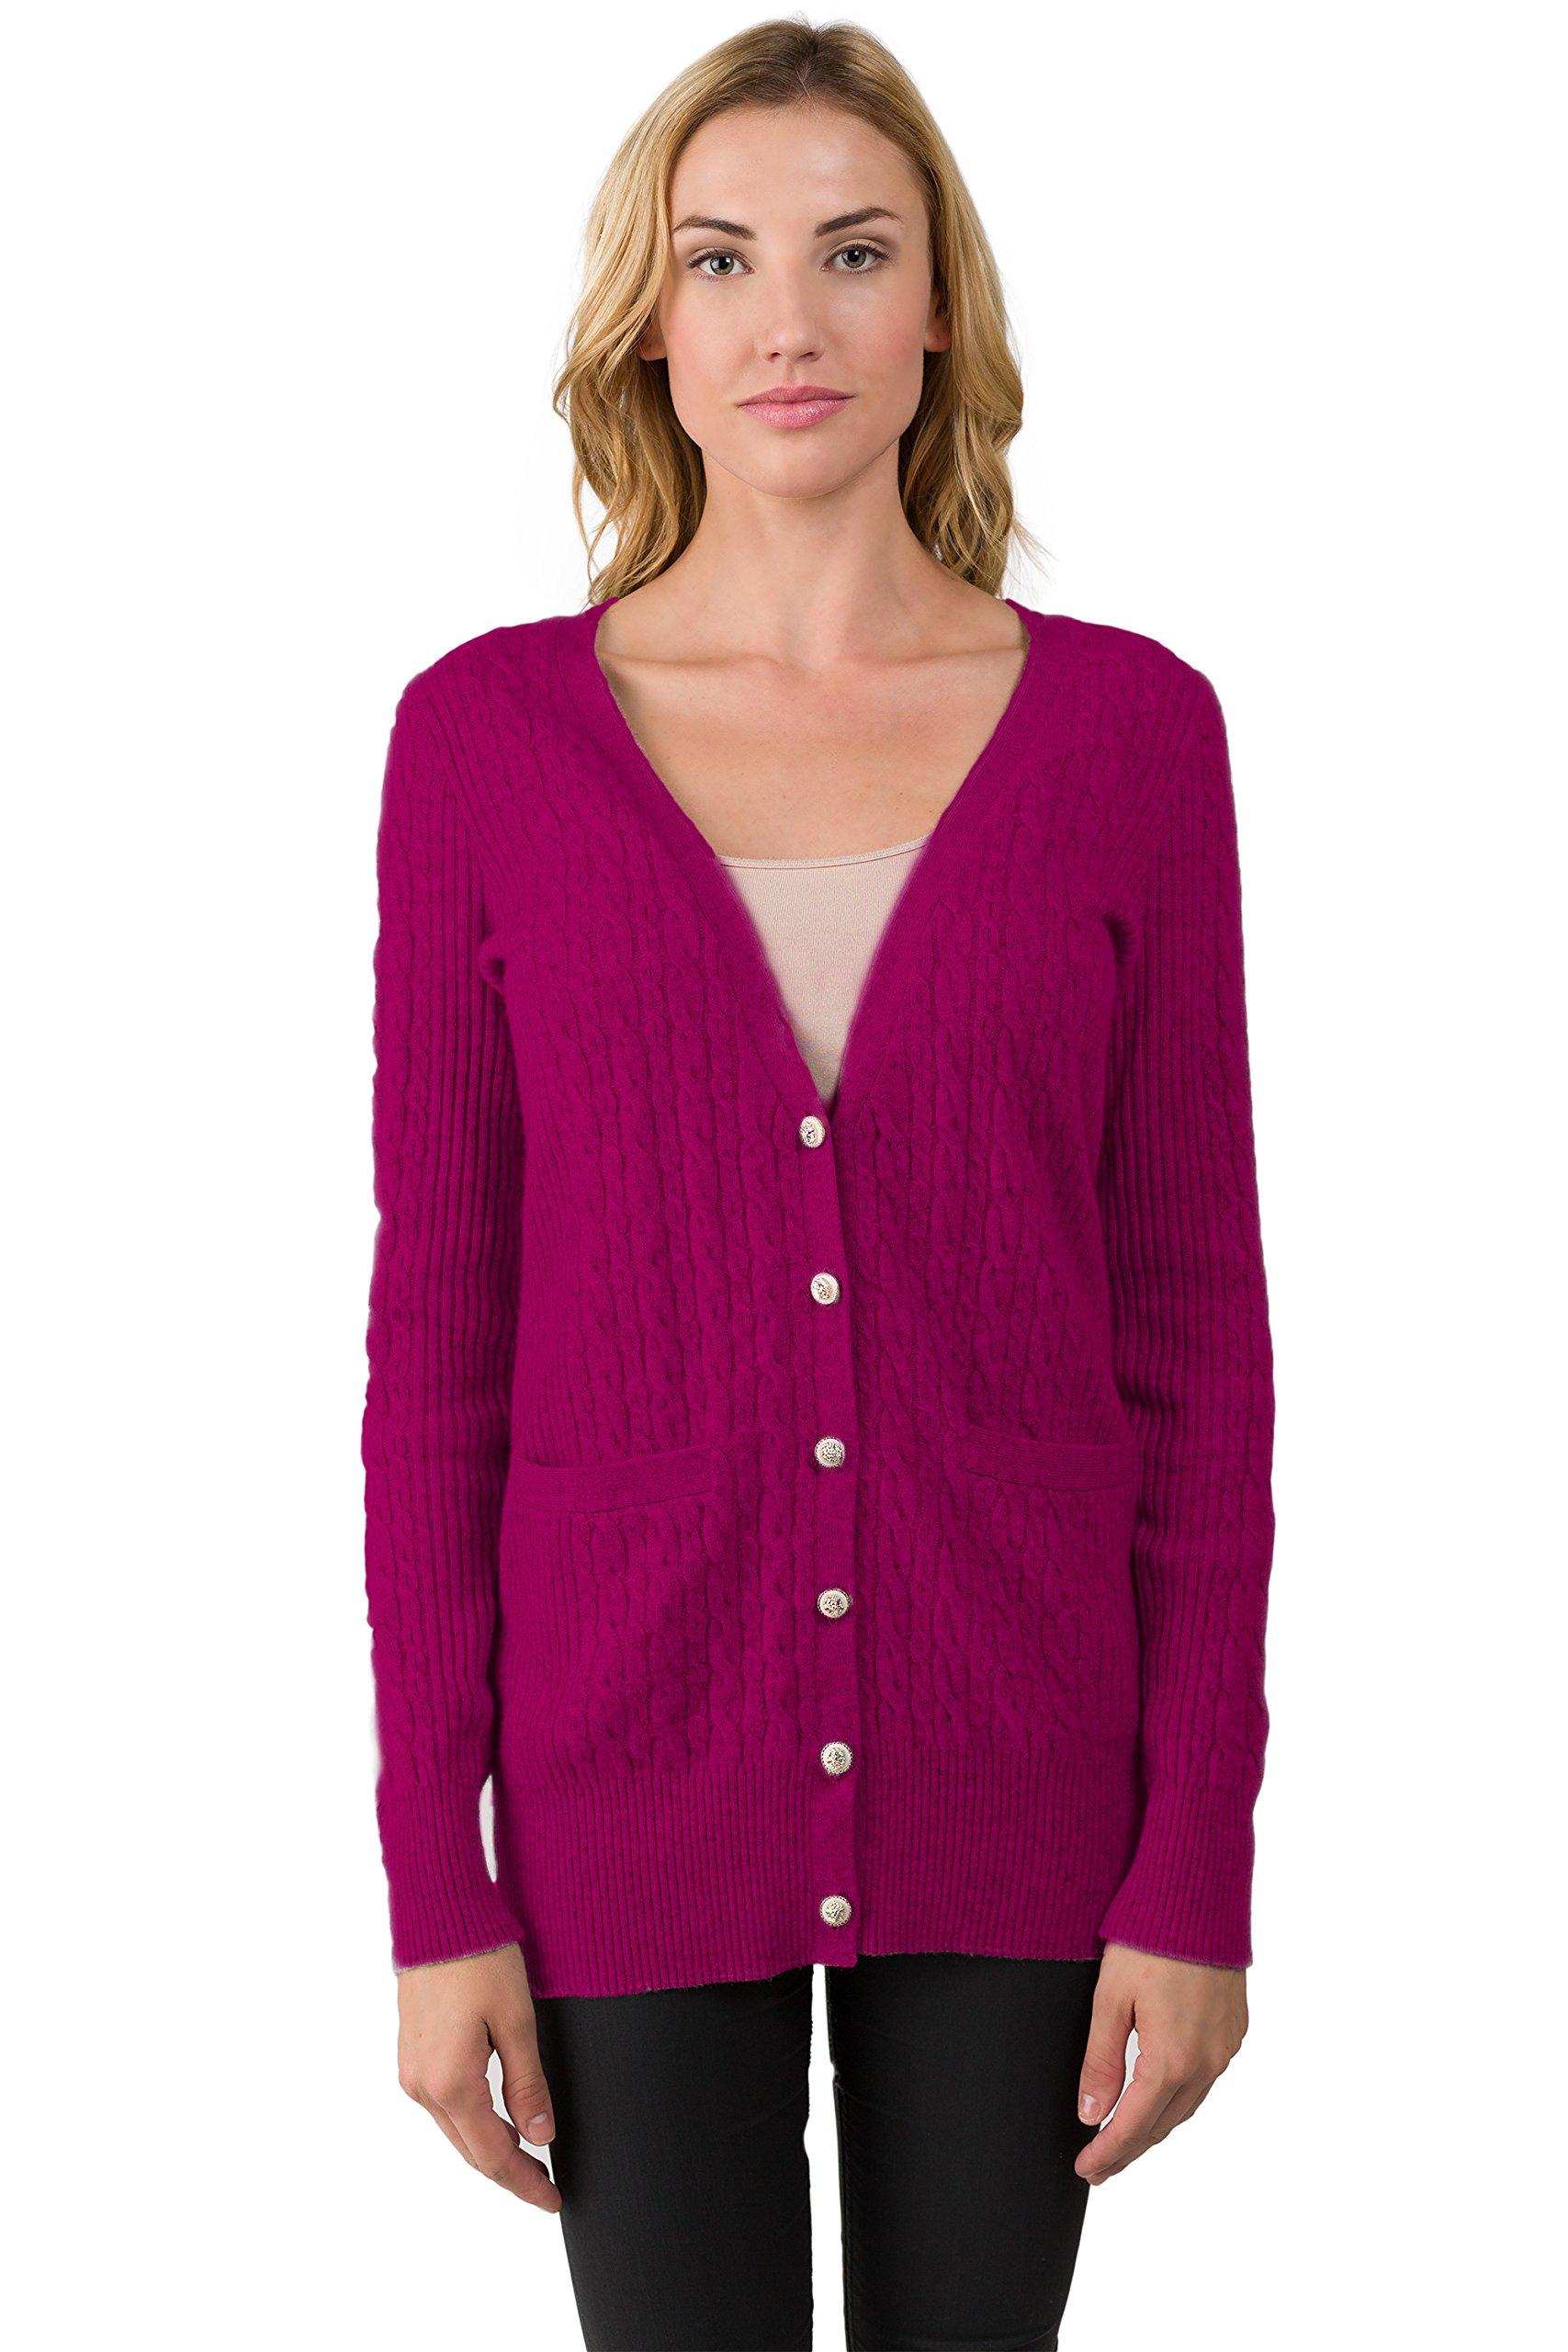 J CASHMERE Women's 100% Cashmere Cable-knit V-neck Long Button Cardigan Sweater Berry Medium